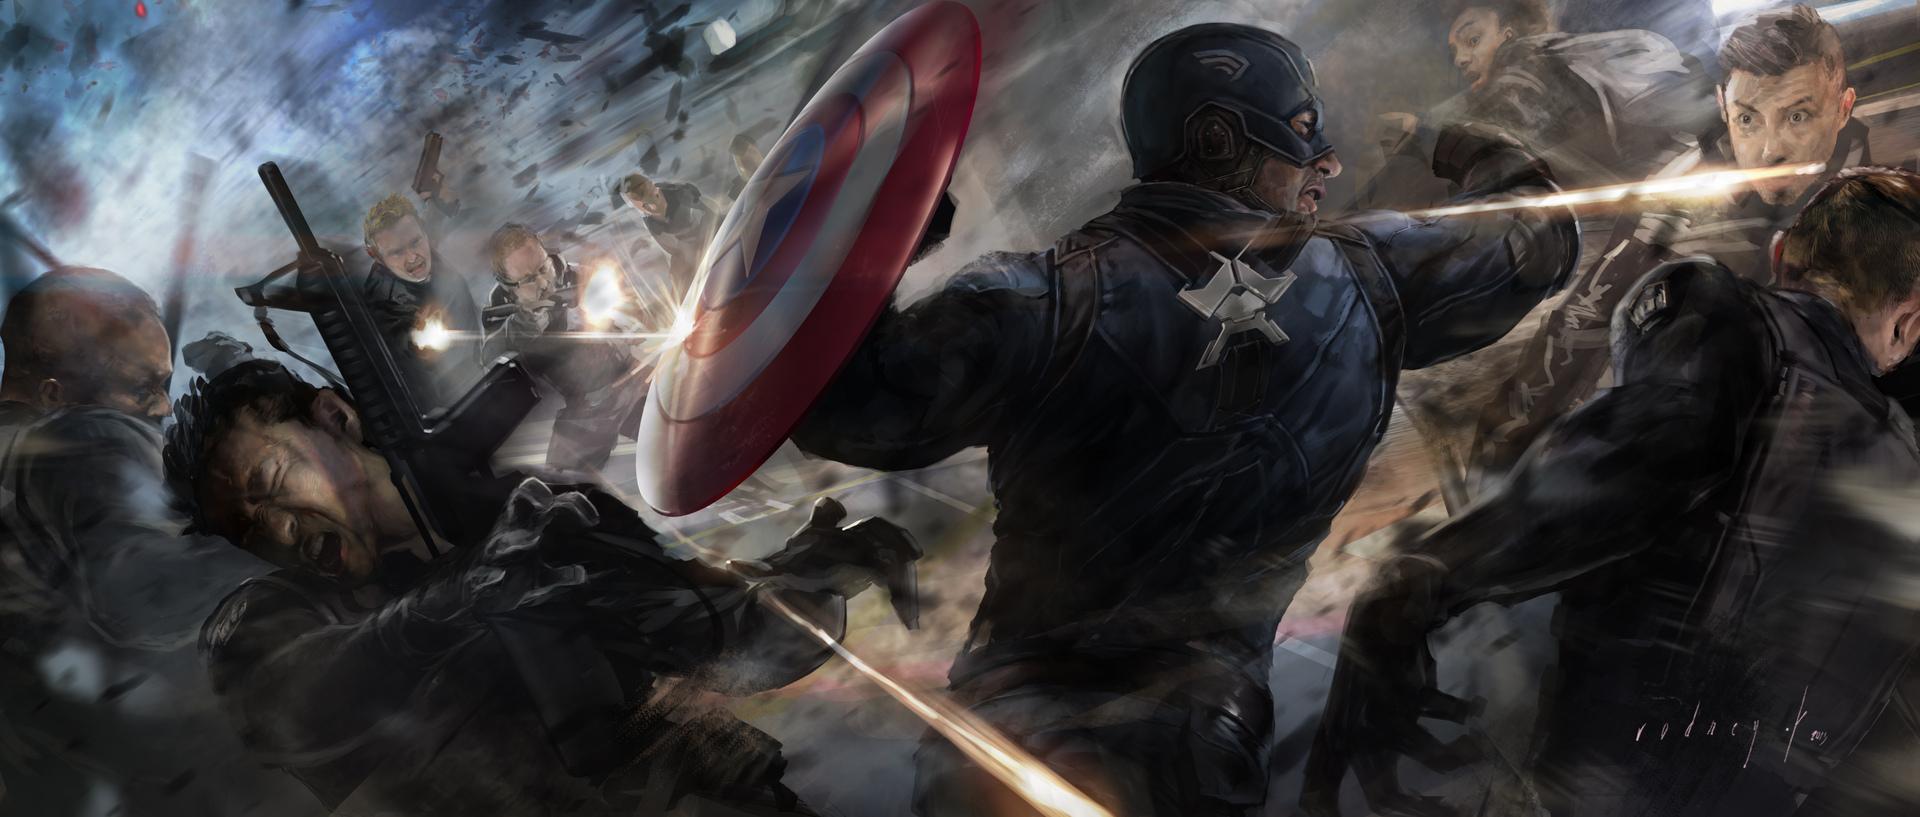 Get Soldier Concept Art  Pictures